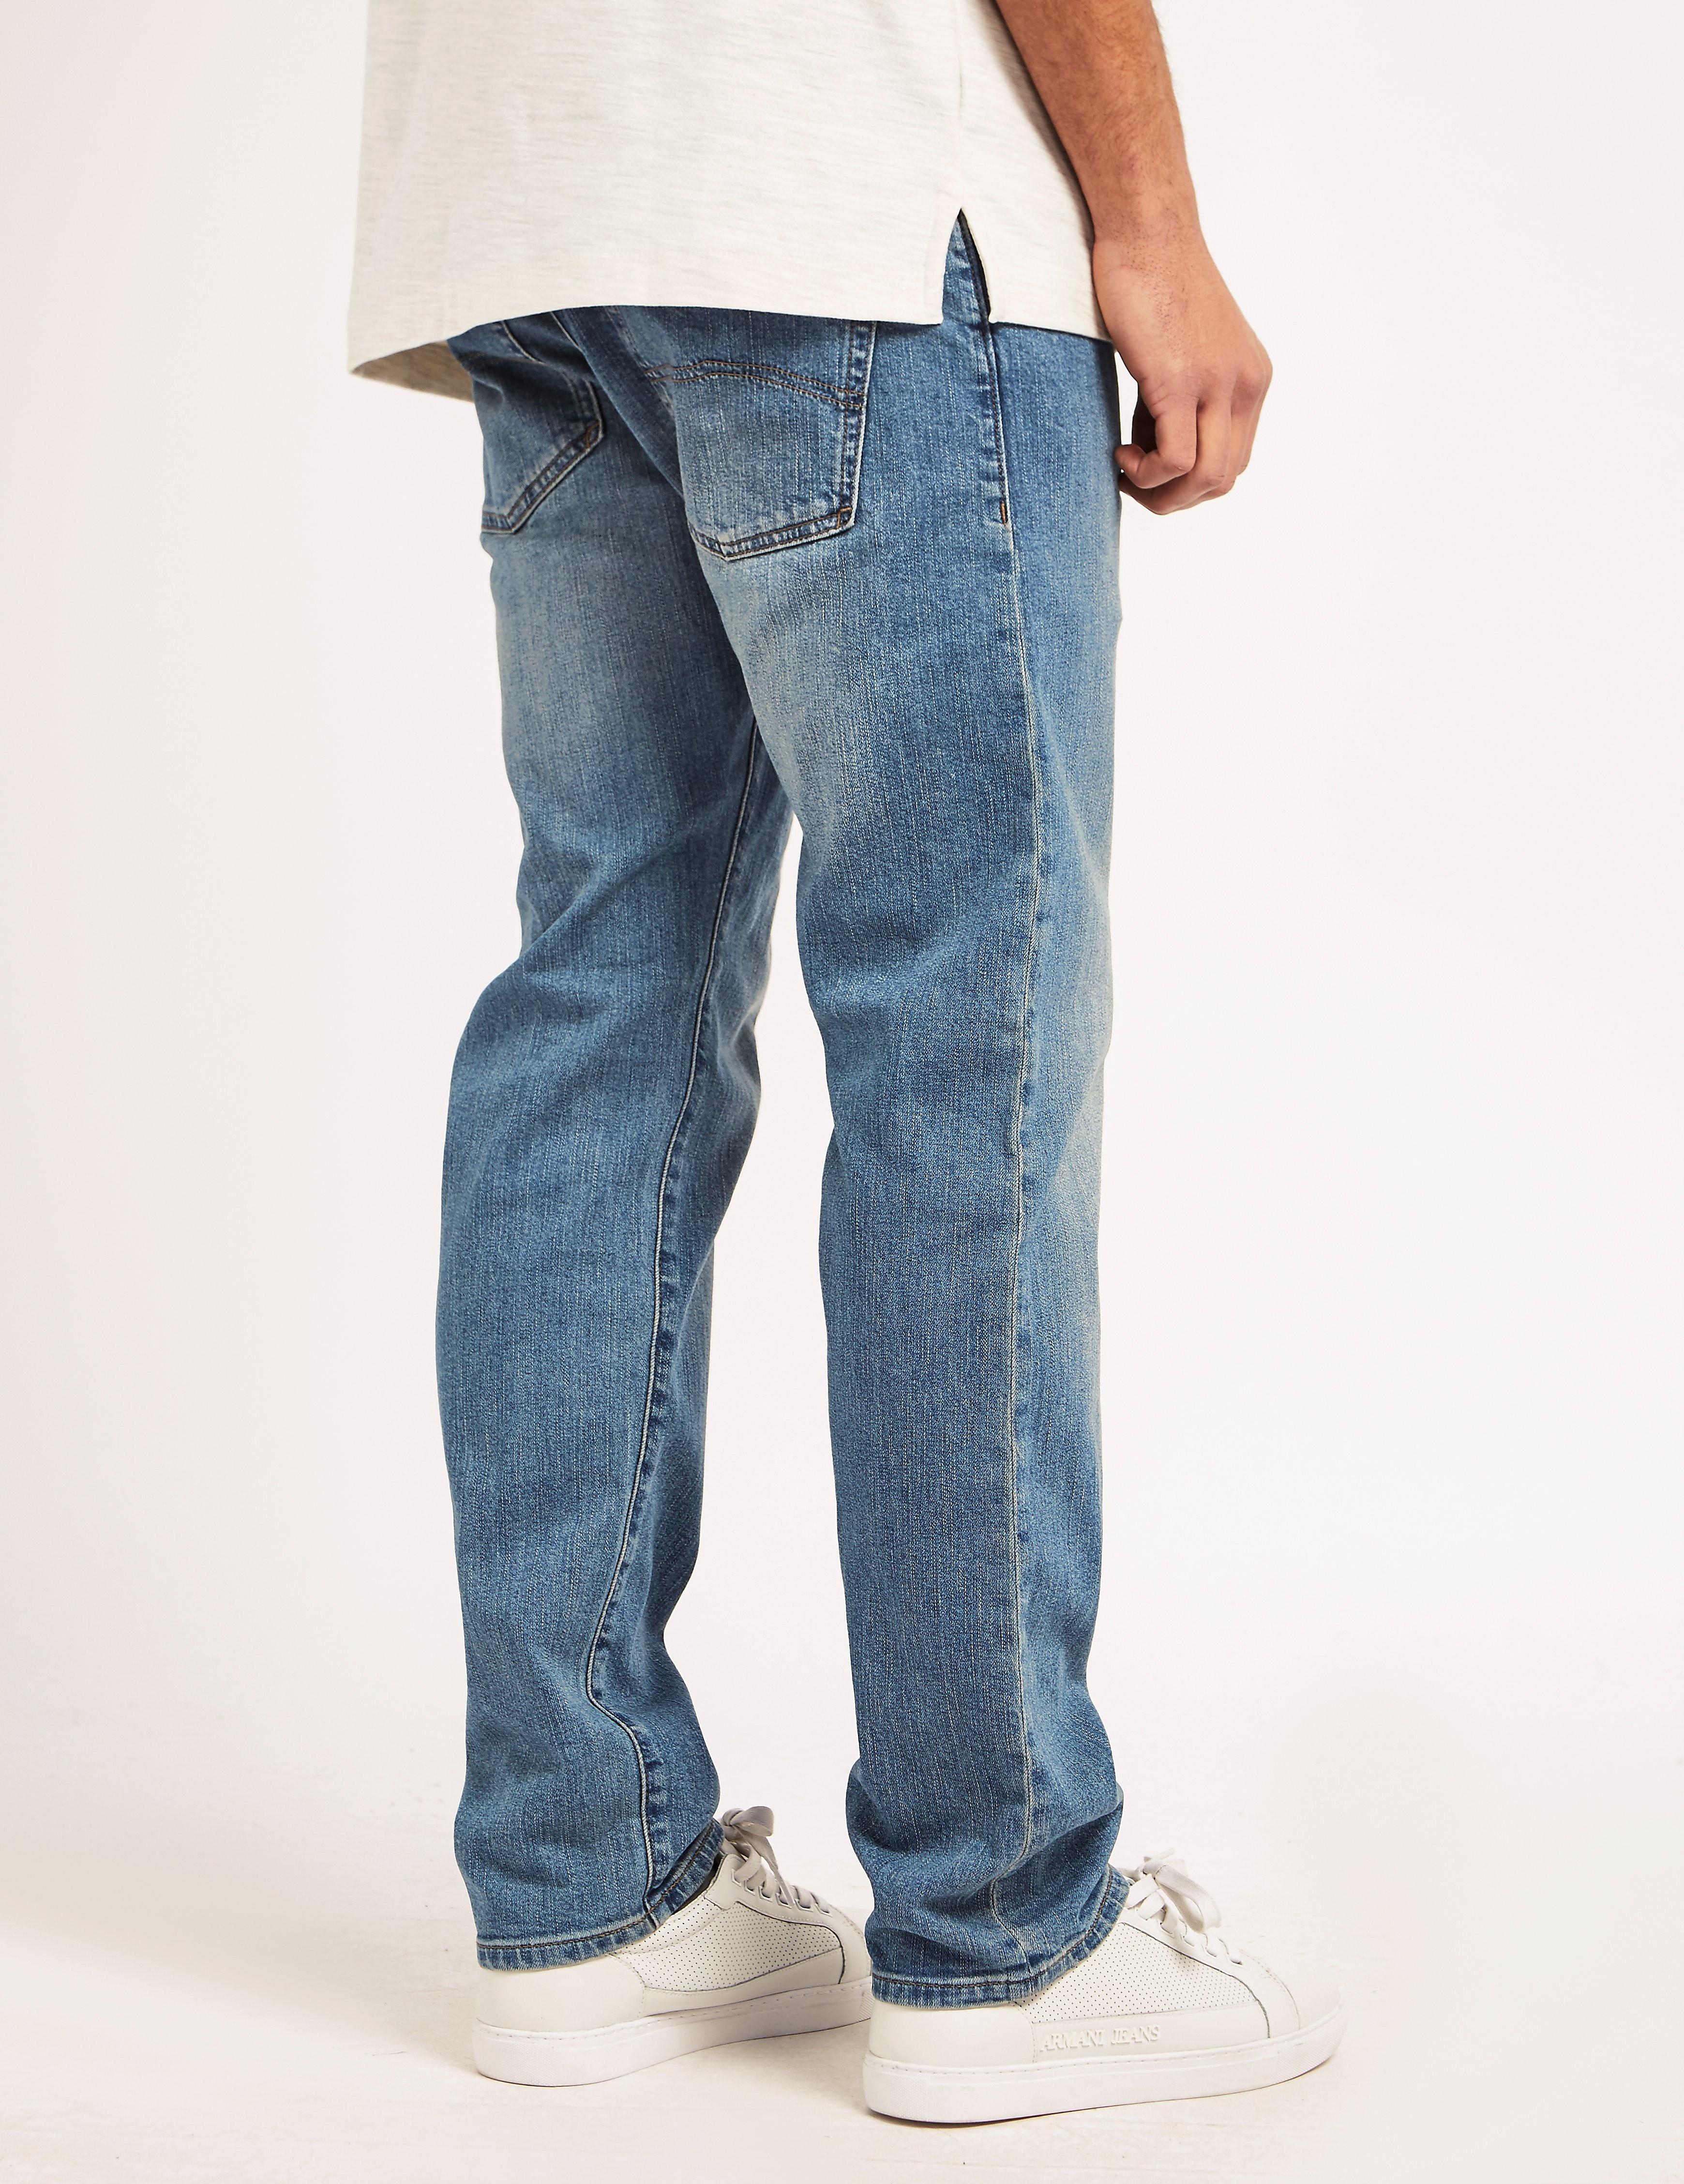 Armani Jeans J45 Stone Long Jeans